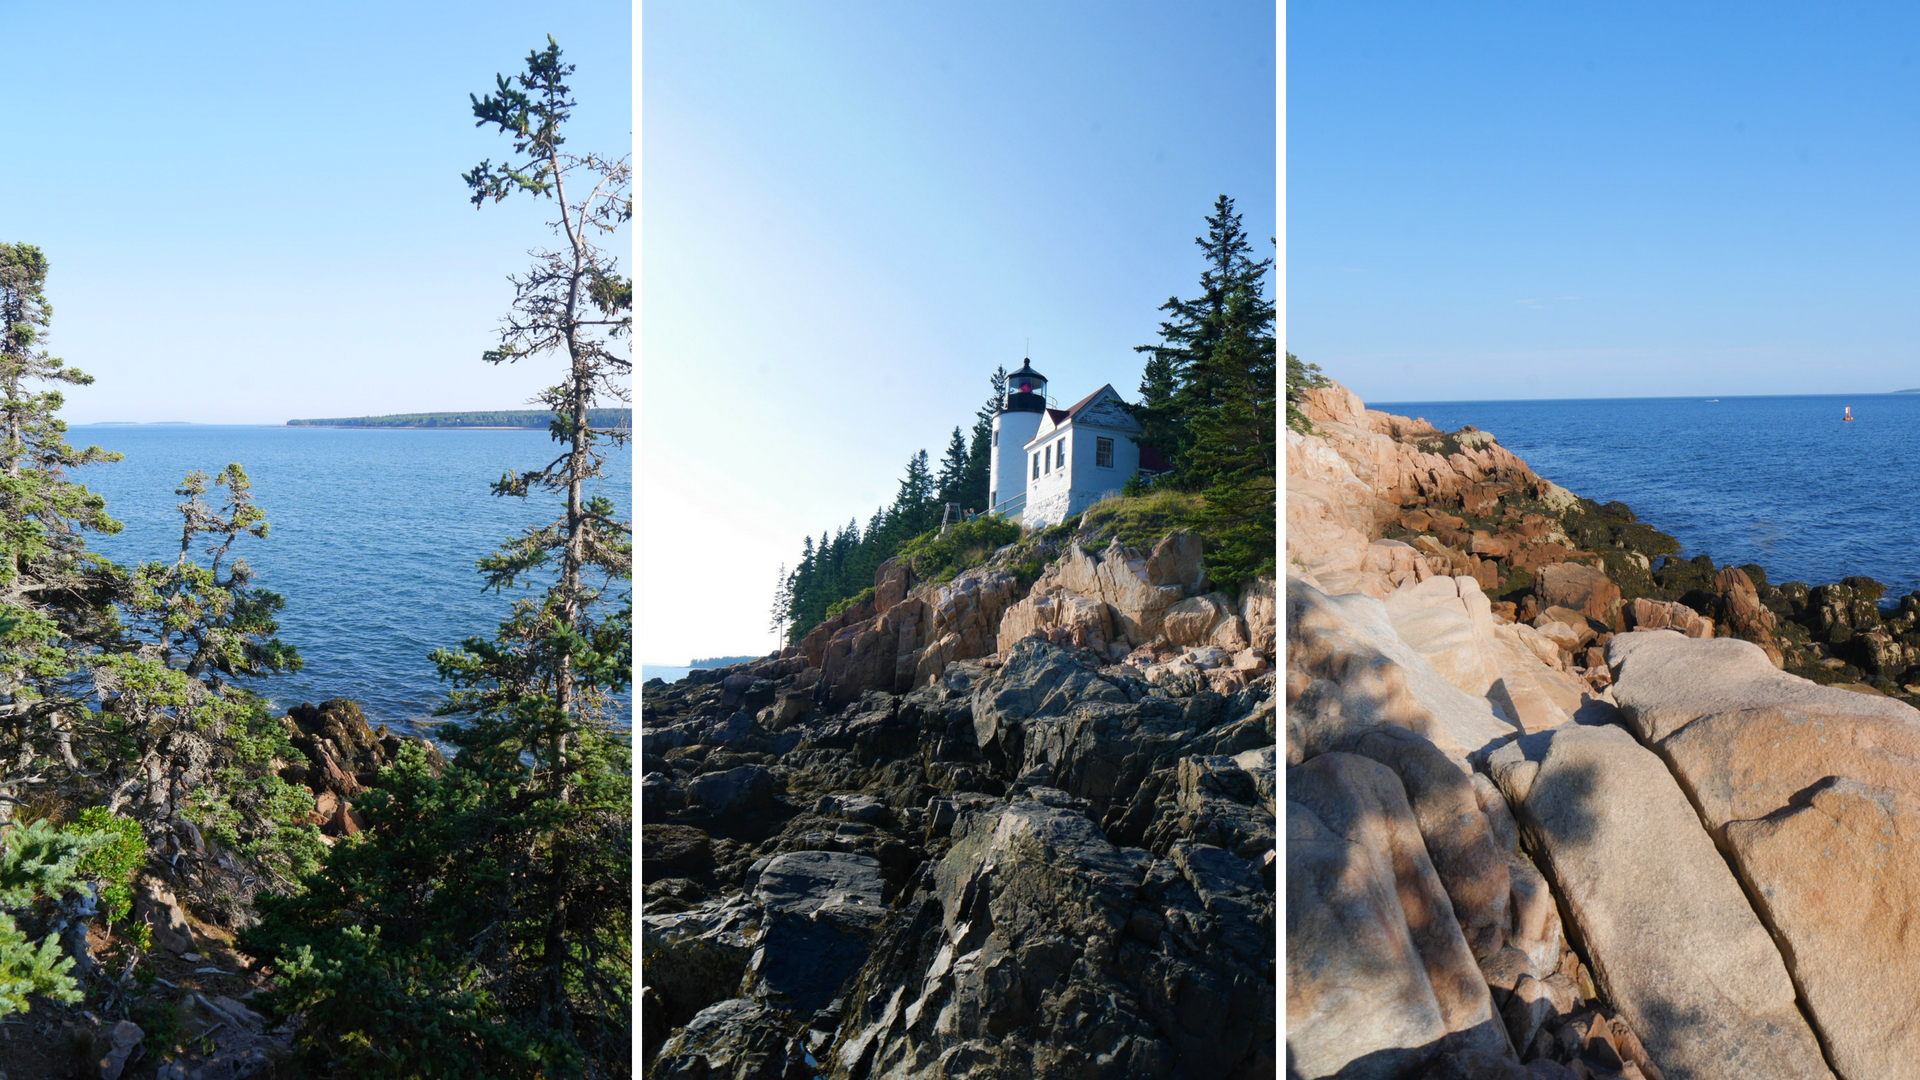 Bass harbor lighthouse acadia national park main etats-unis blog voyage road-trip arpenter le chemin